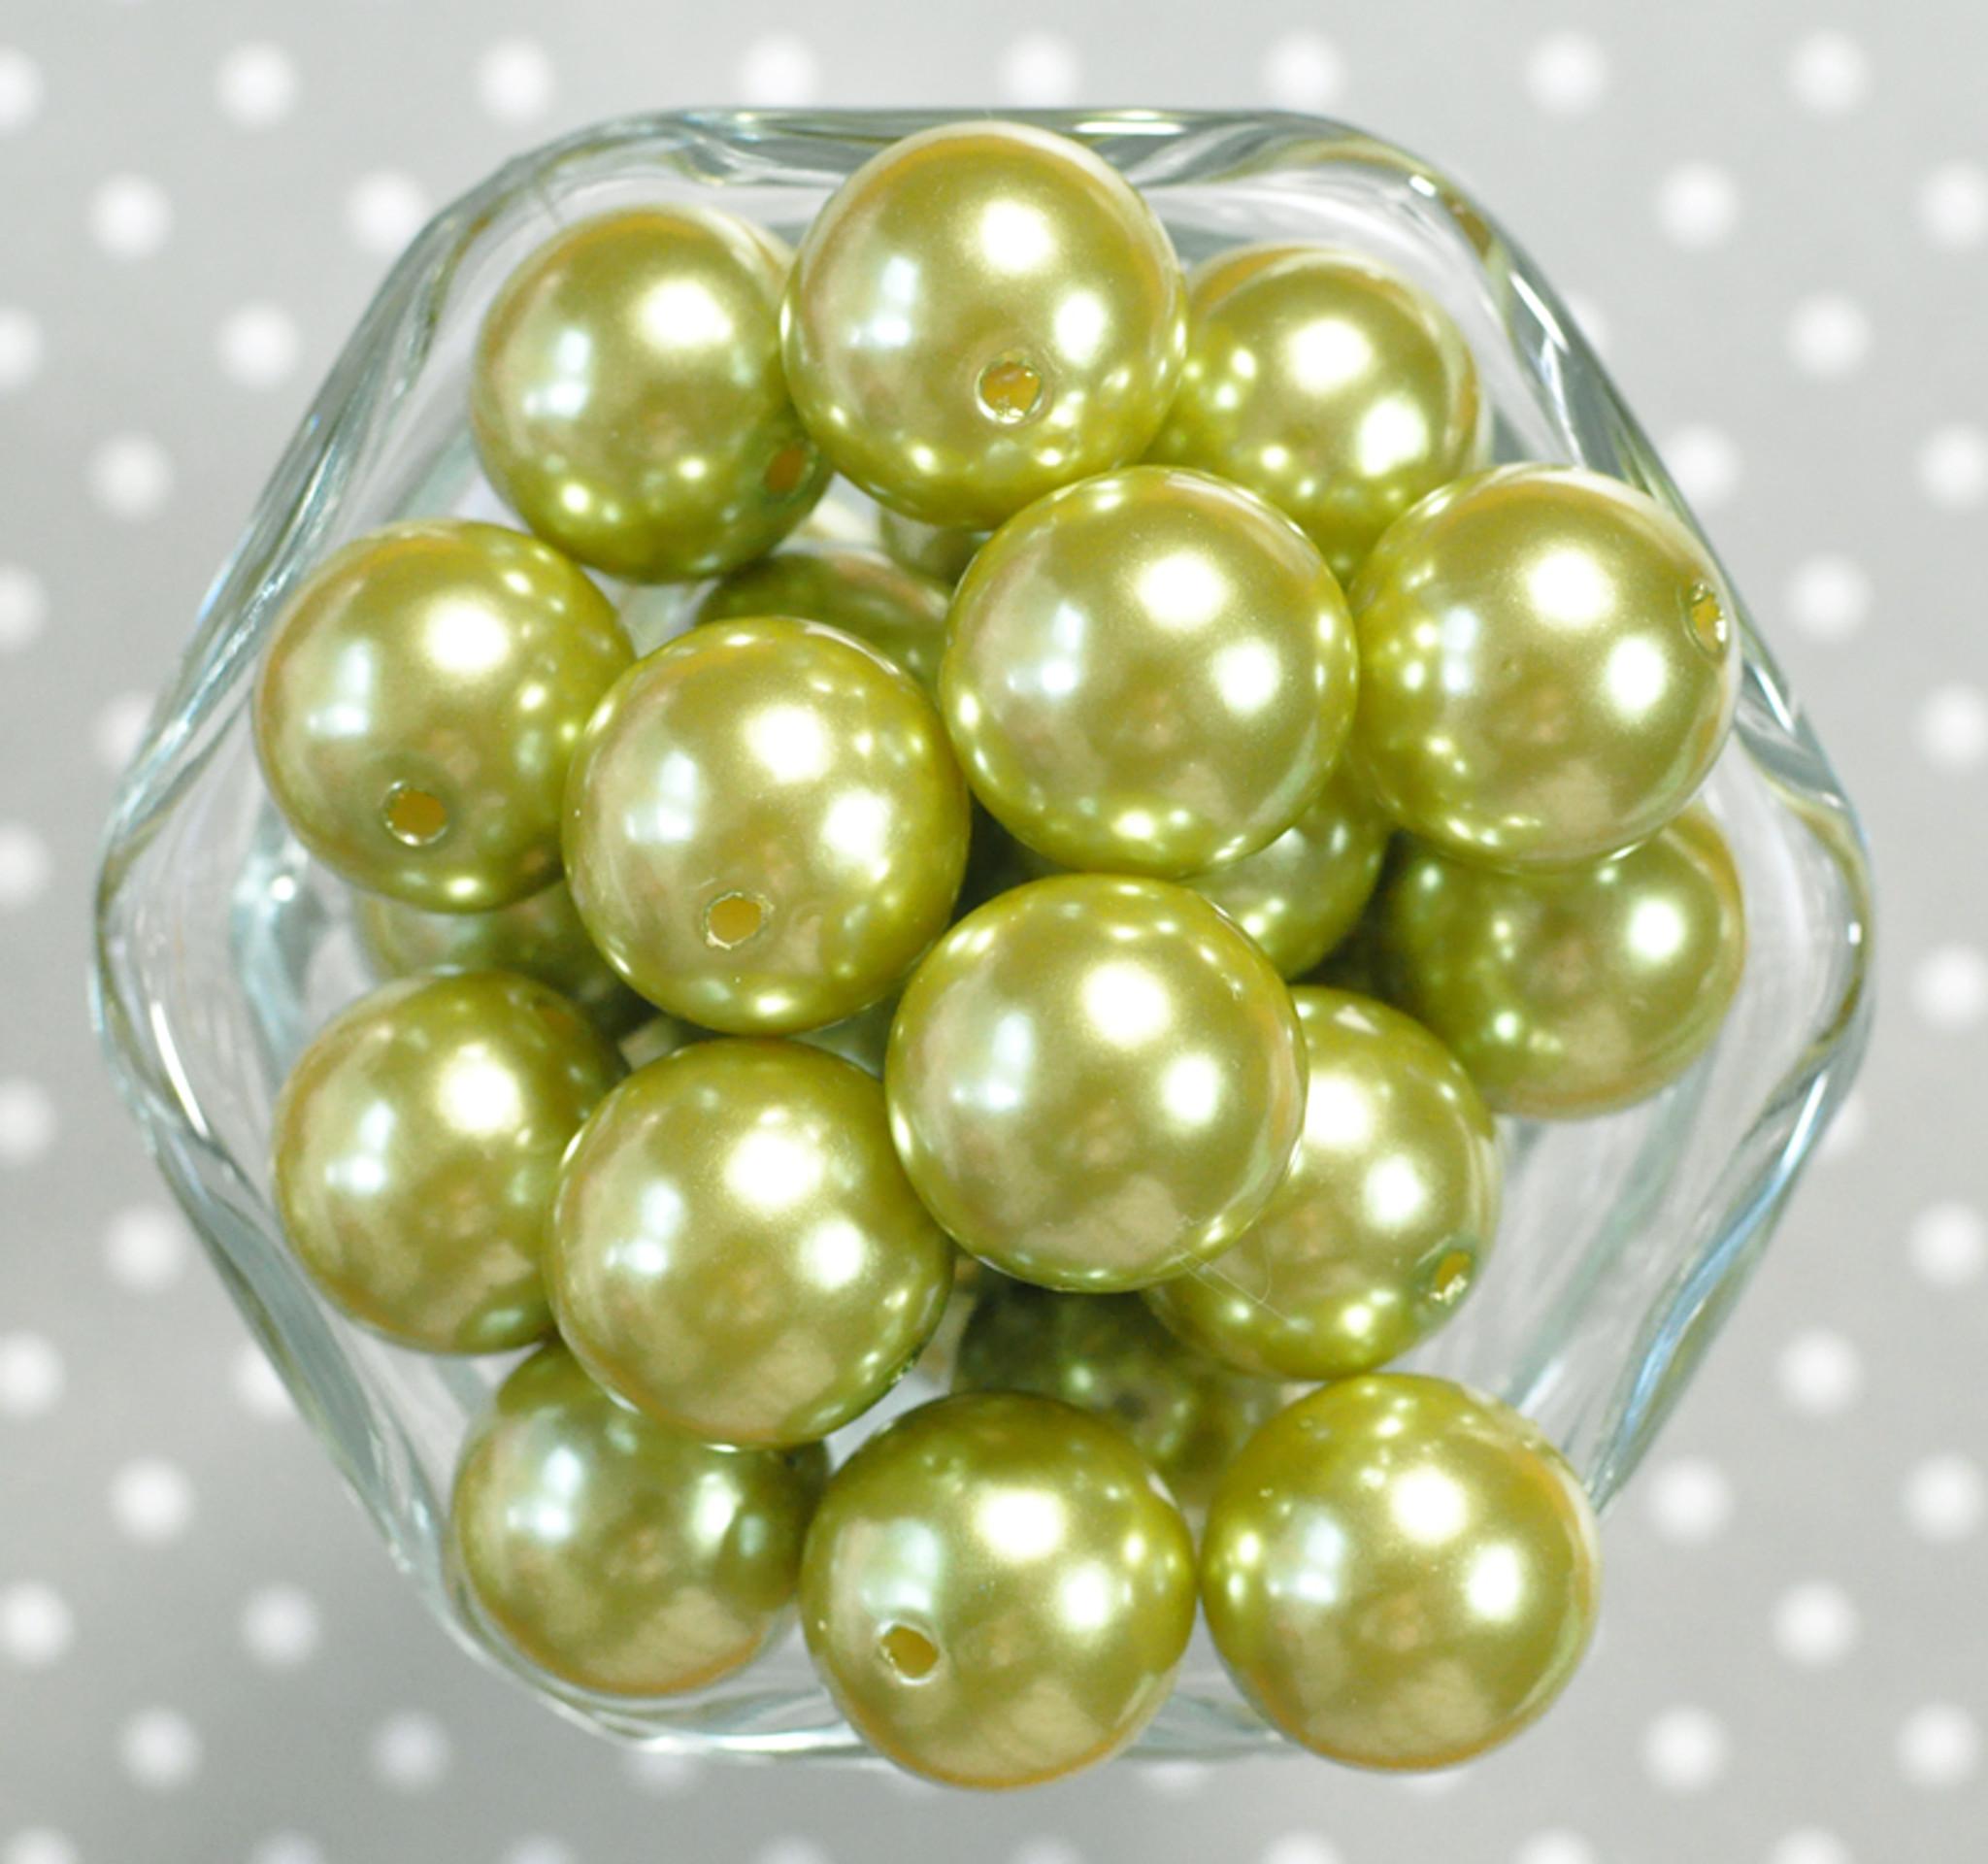 20mm Light Olive green pearl bubblegum beads